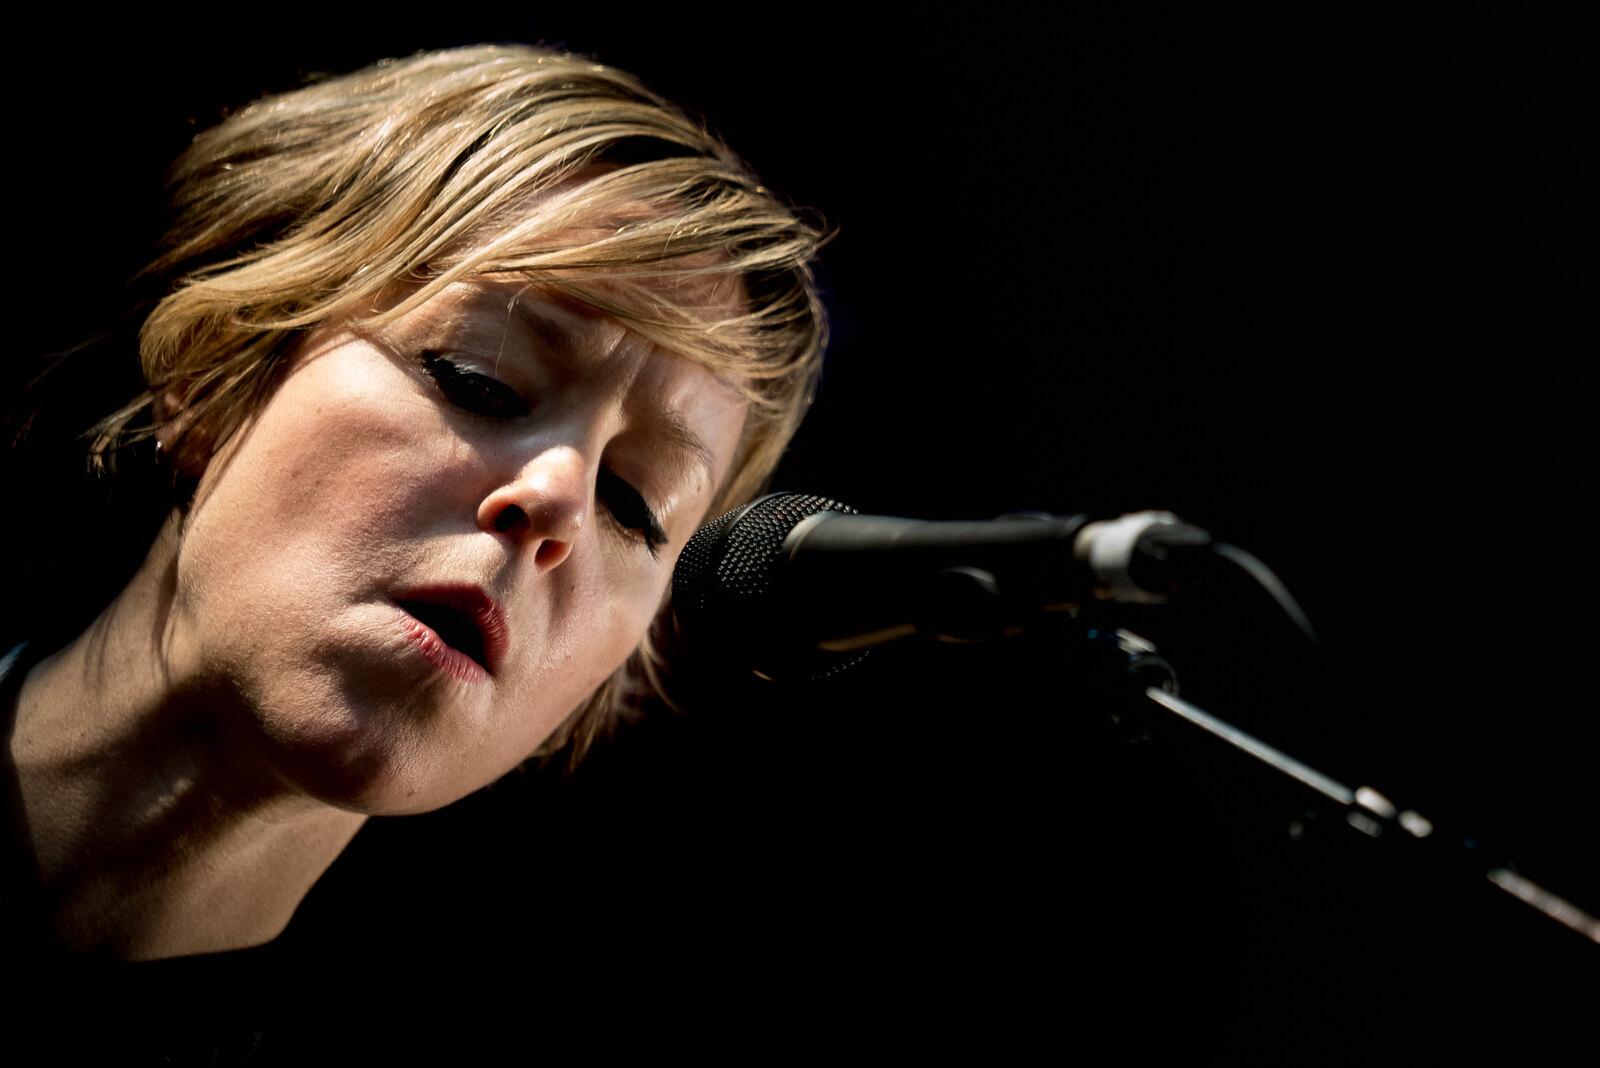 Daylight Music 244 - Emily Barker presents....